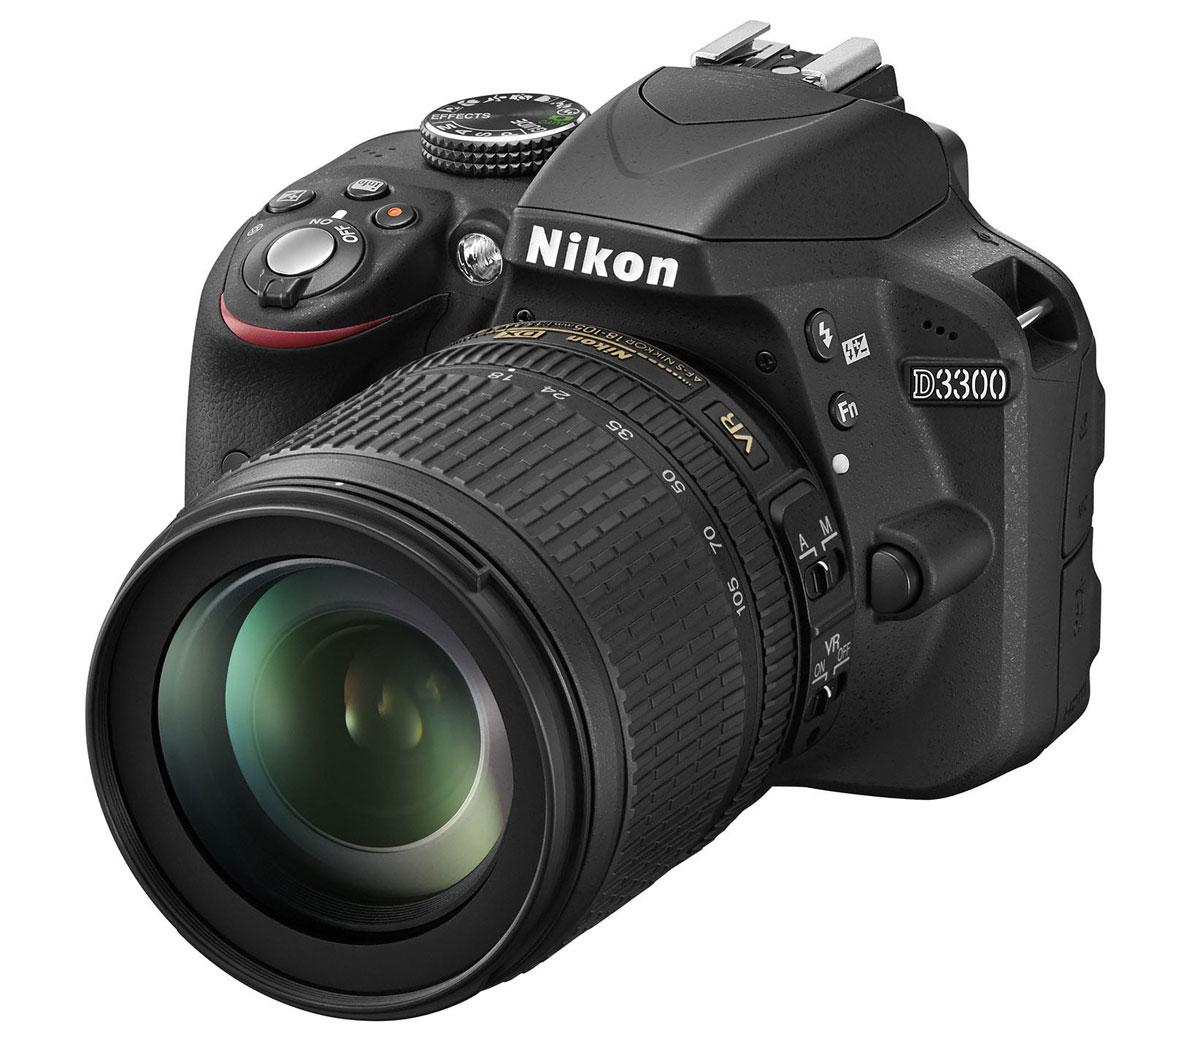 Nikon D3300 Kit 18-105 VR, Black цифровая зеркальная фотокамера ( VBA390K005 )